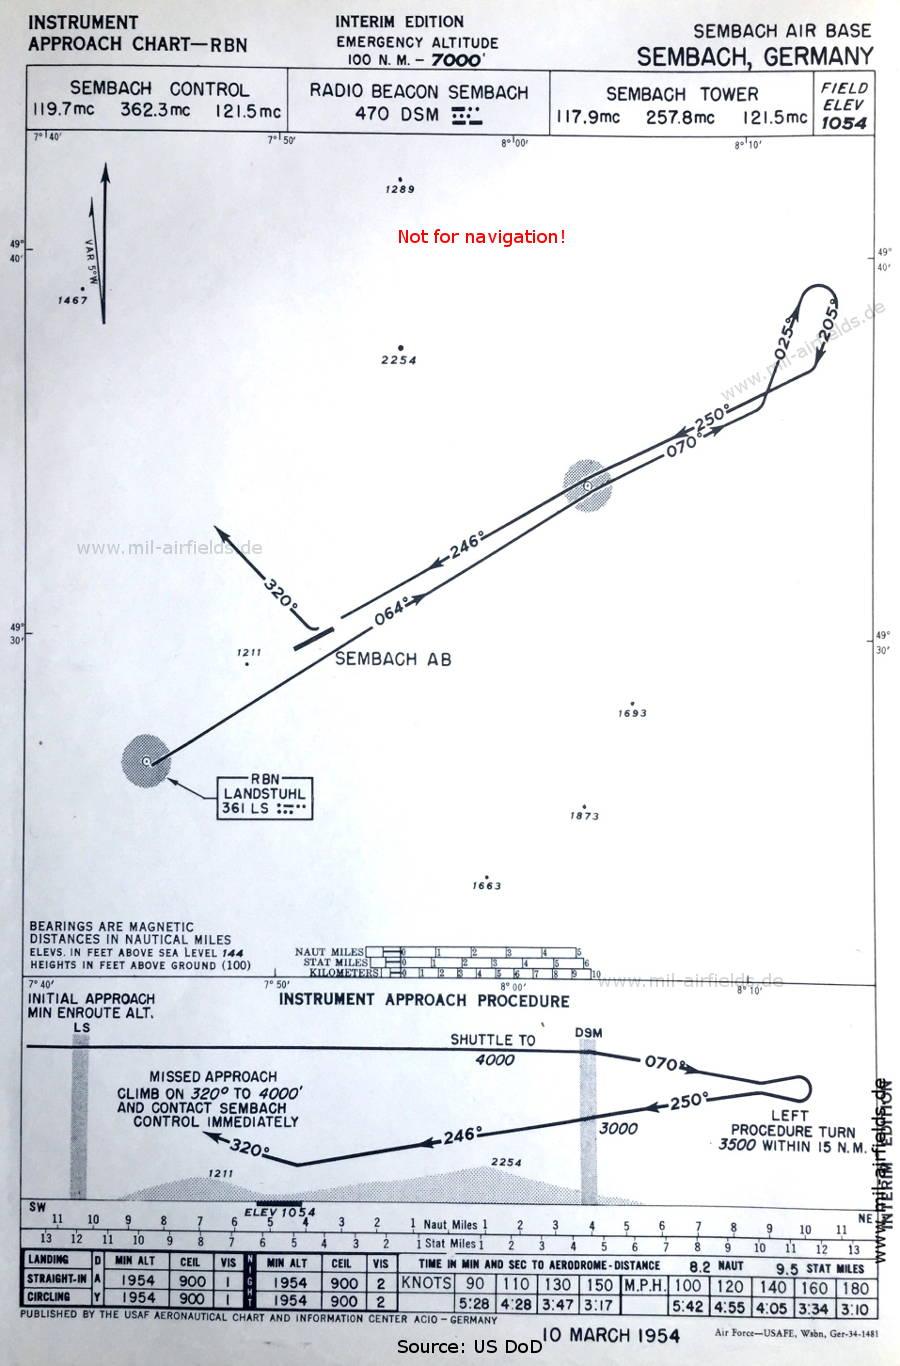 NDB approach runway 25 Sembach Air Base, Germany 1954